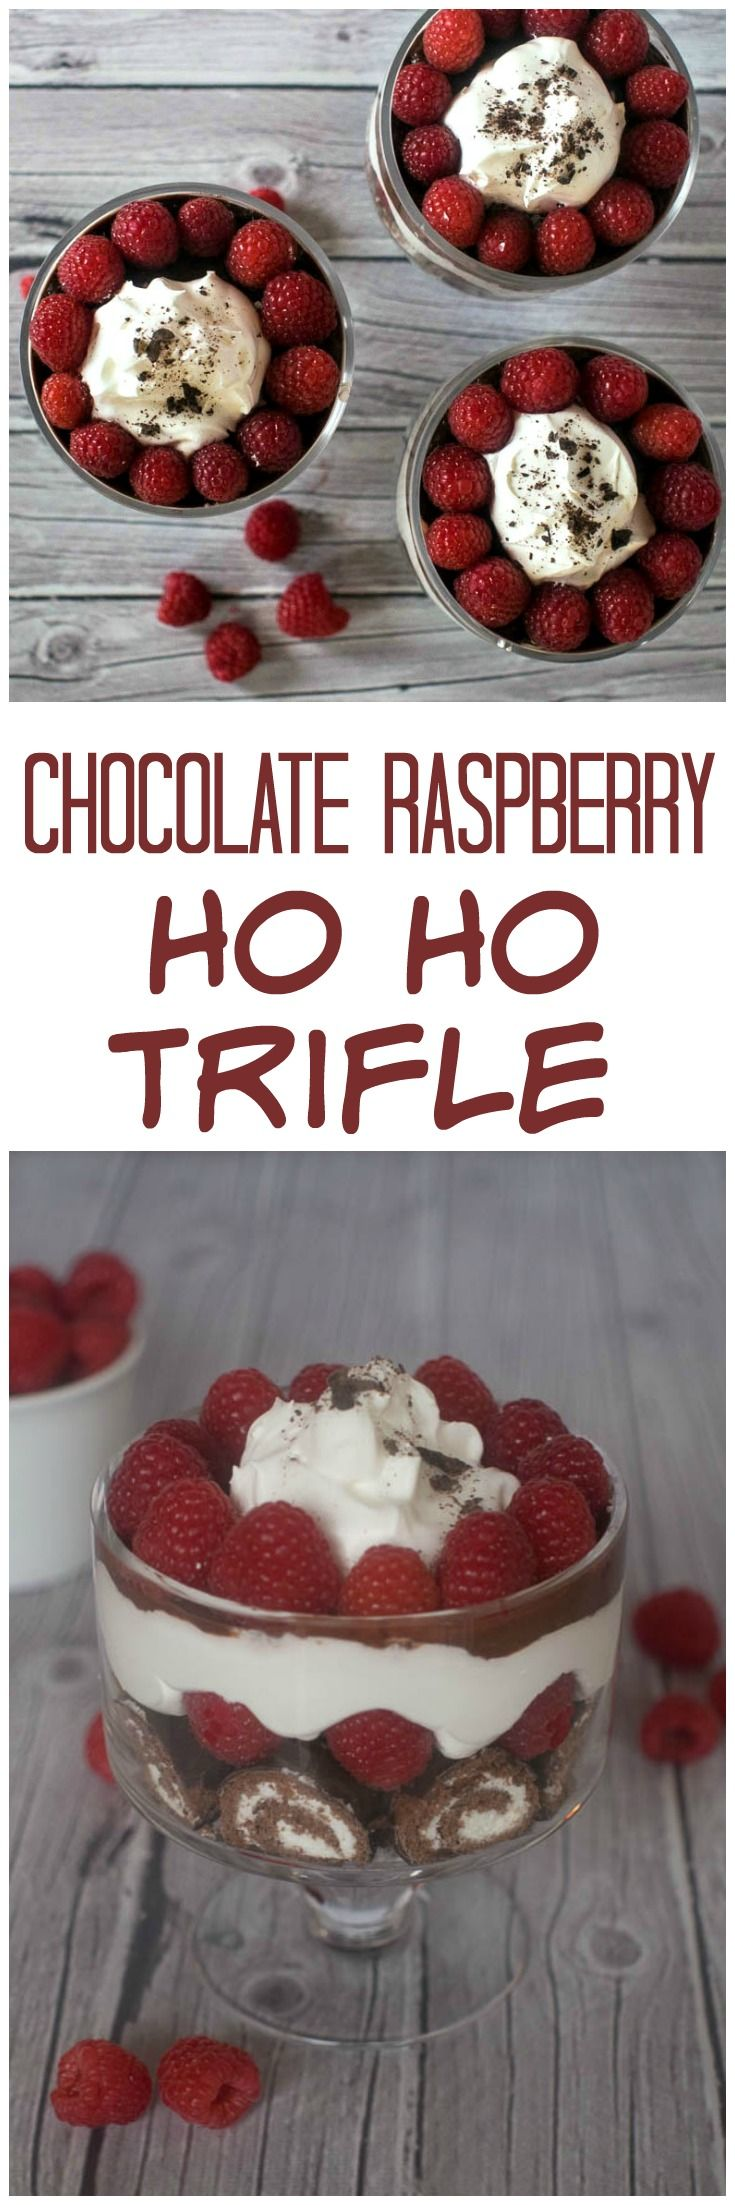 Chocolate Raspberry Ho Ho Trifle | Easy Dessert | Valentine's Day | HoHo | Trifle | 15 Minute Dessert | 5 Ingredient Dessert | Raspberries